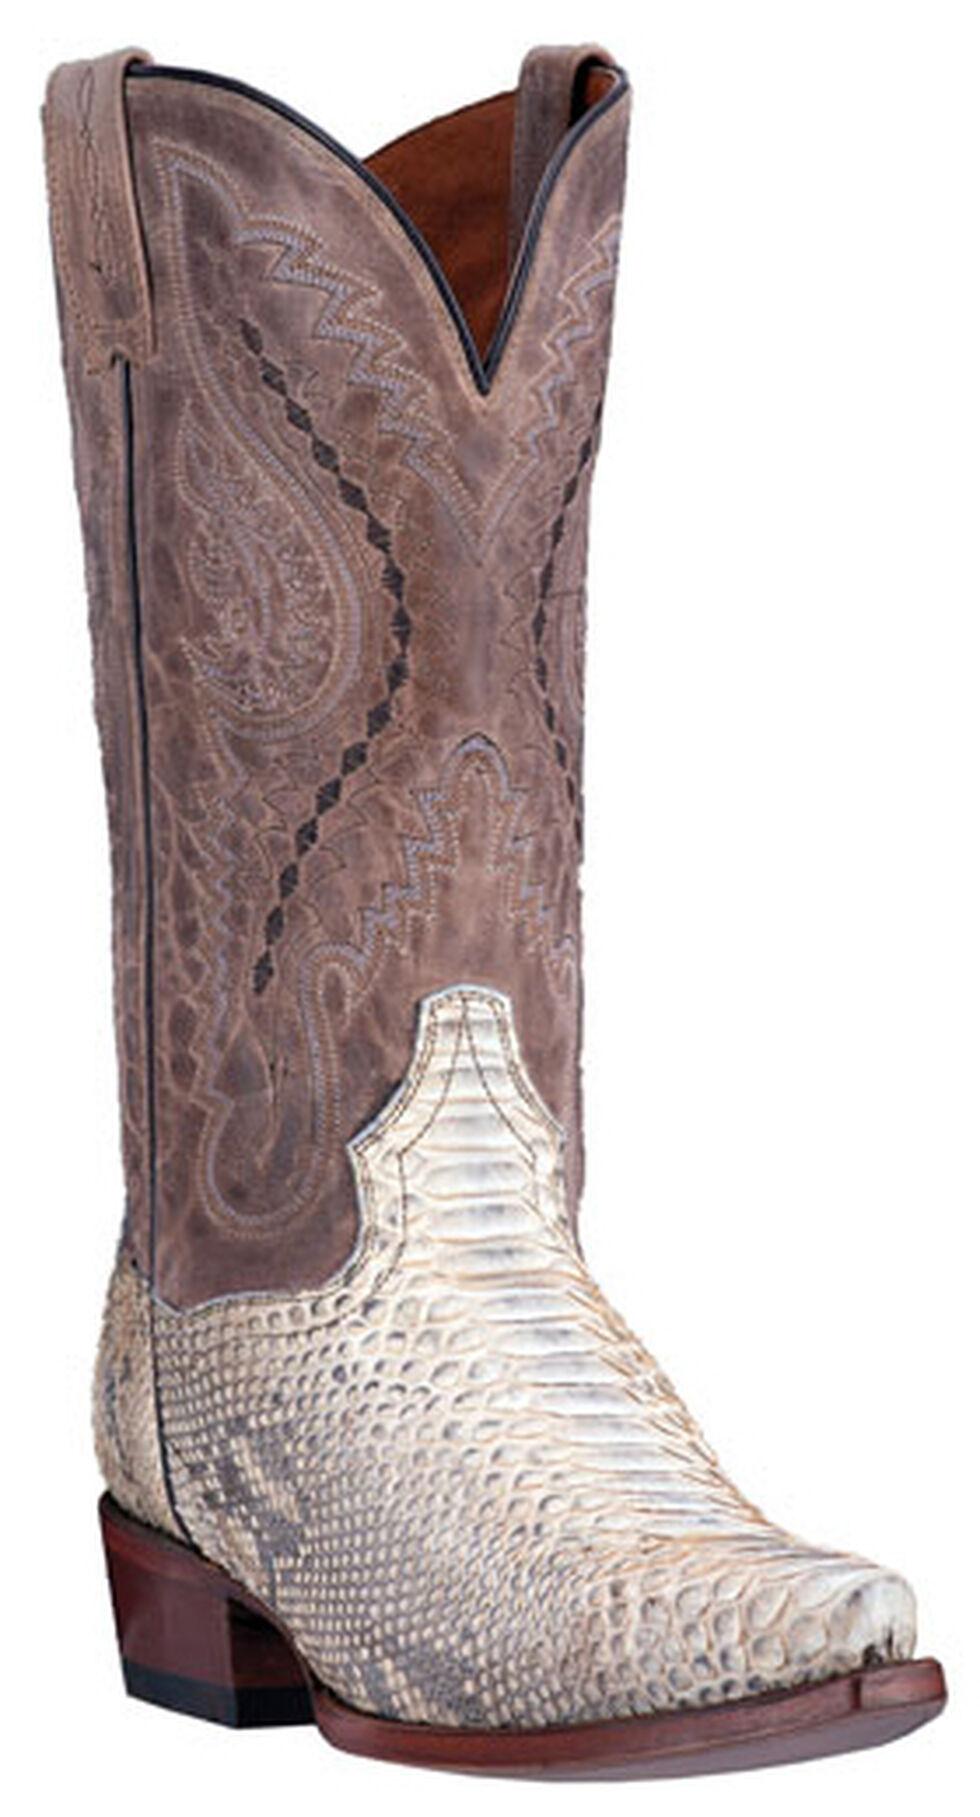 Dan Post Python Orlando Cowboy Boots - Snip Toe , Natural, hi-res